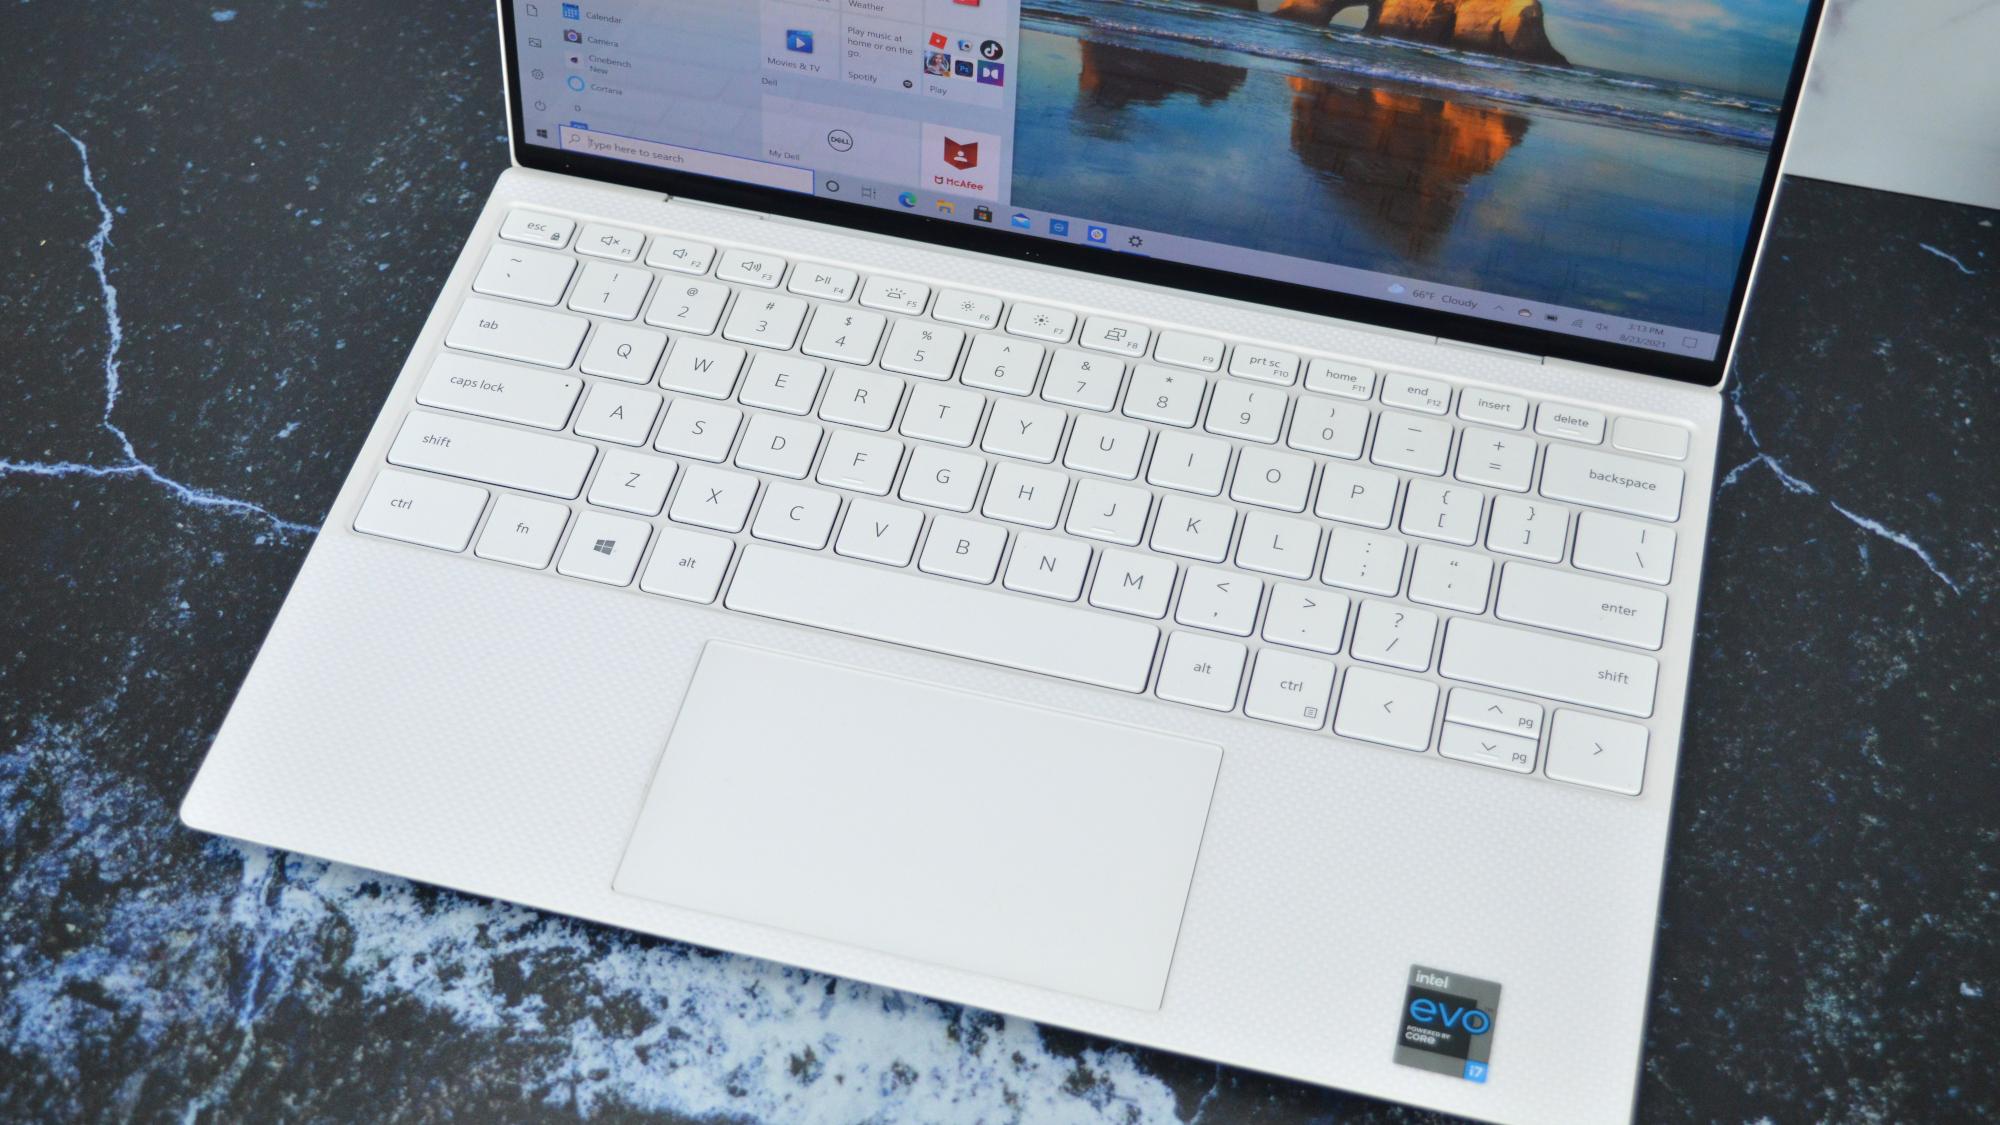 Dell XPS 13 9310 Keyboard